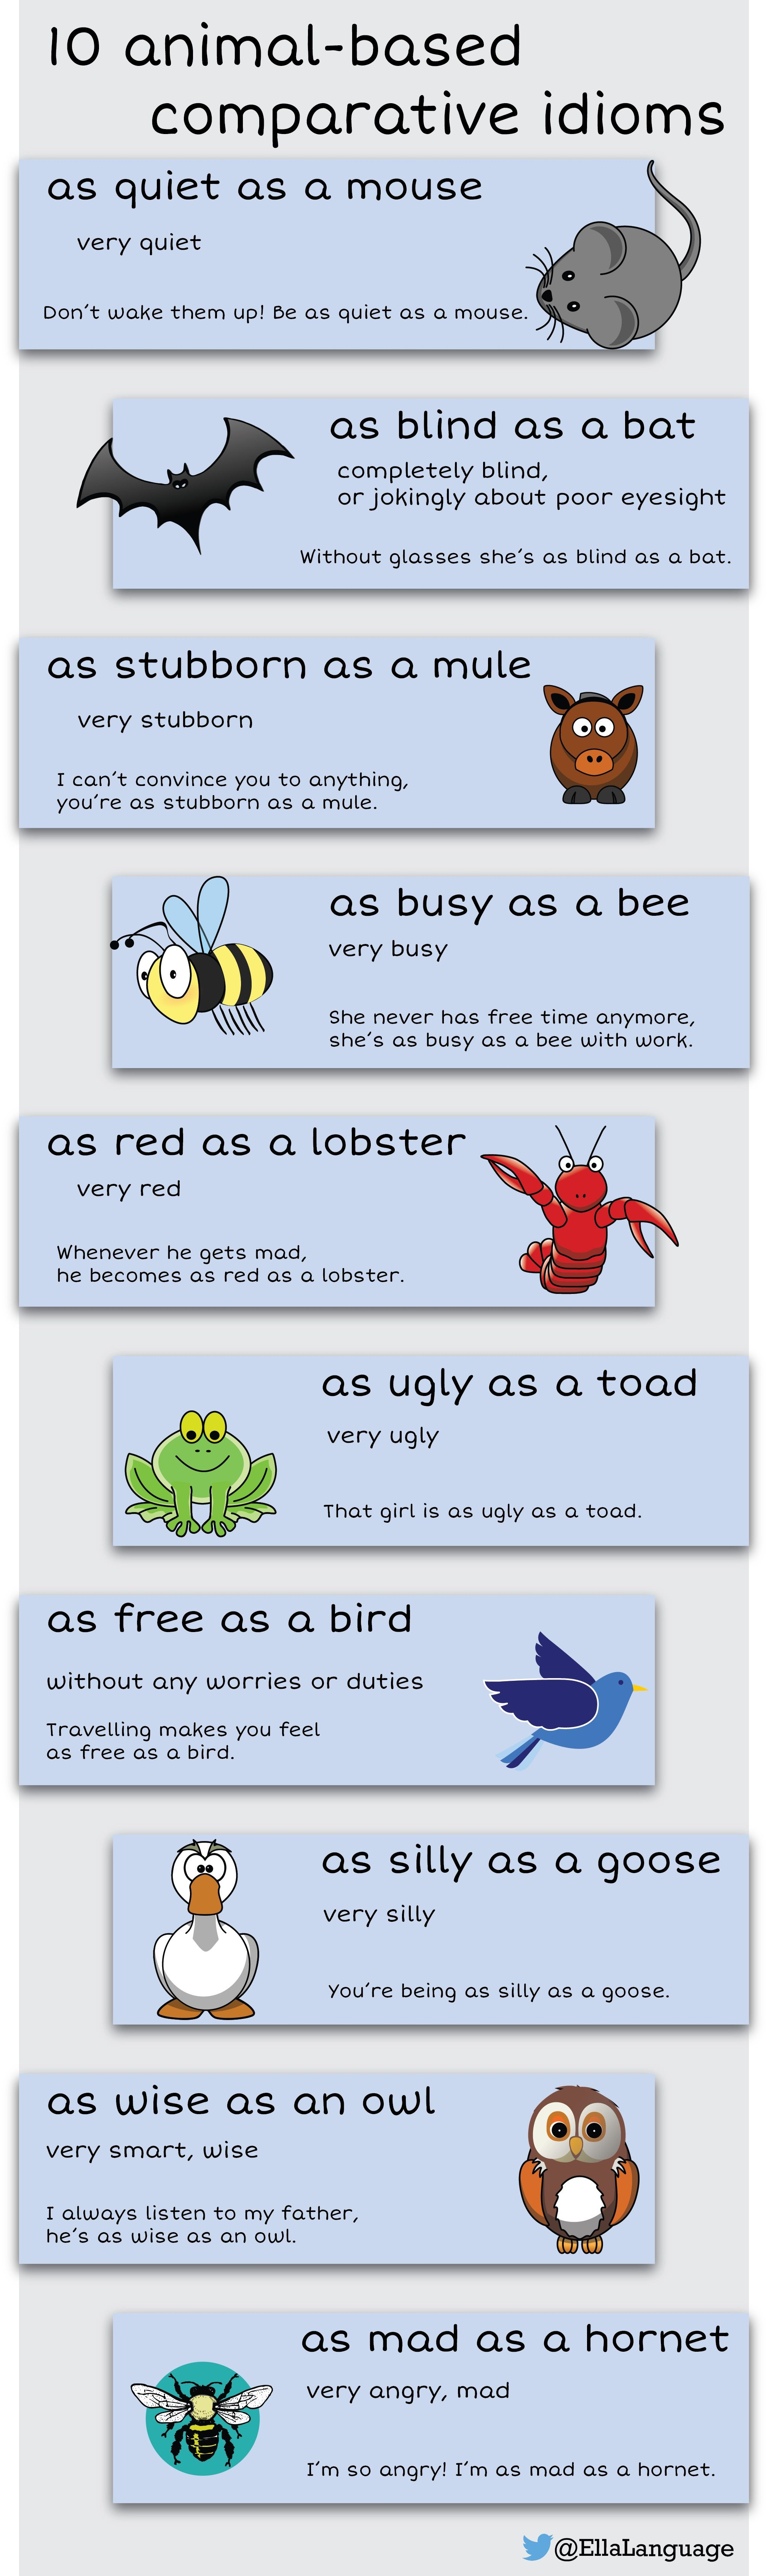 10 Comparative Idioms Animals Idioms Esl English